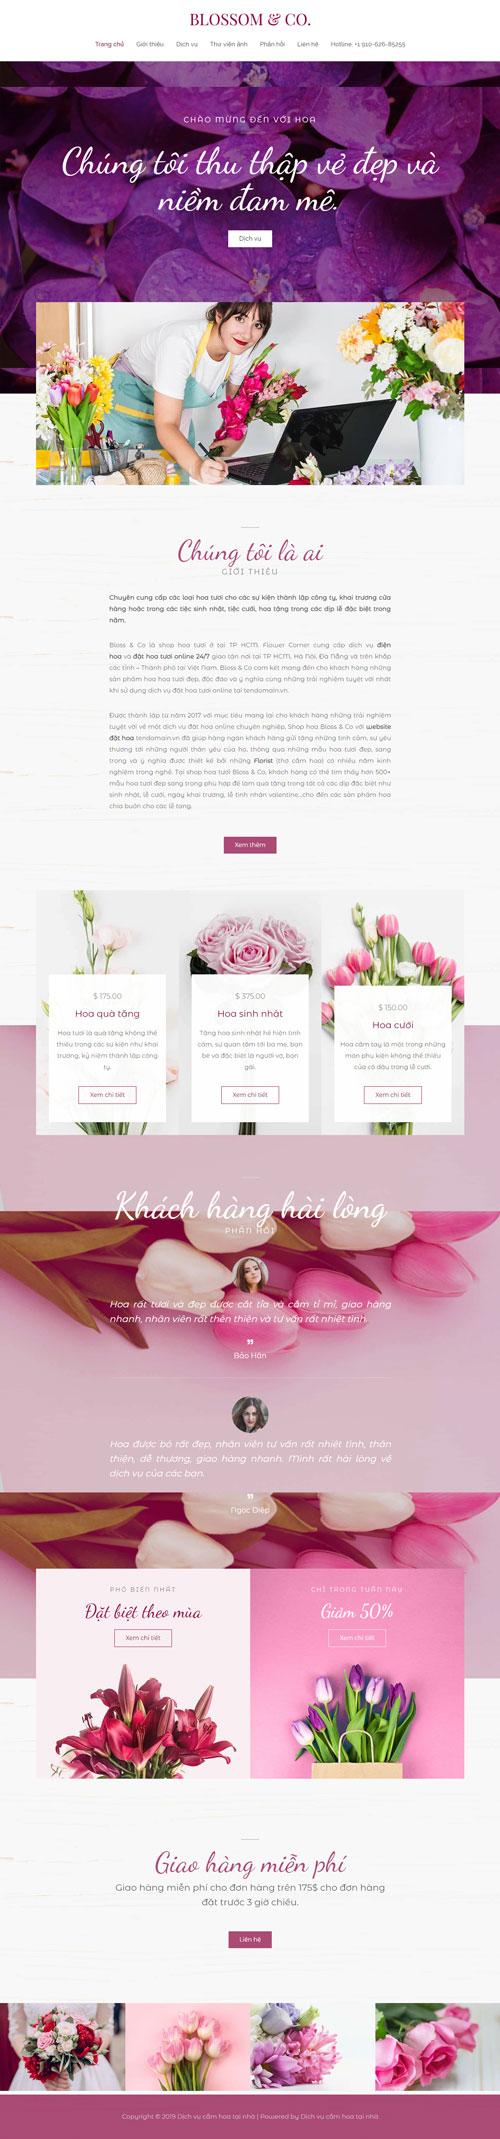 website-dich-vu-cam-hoa